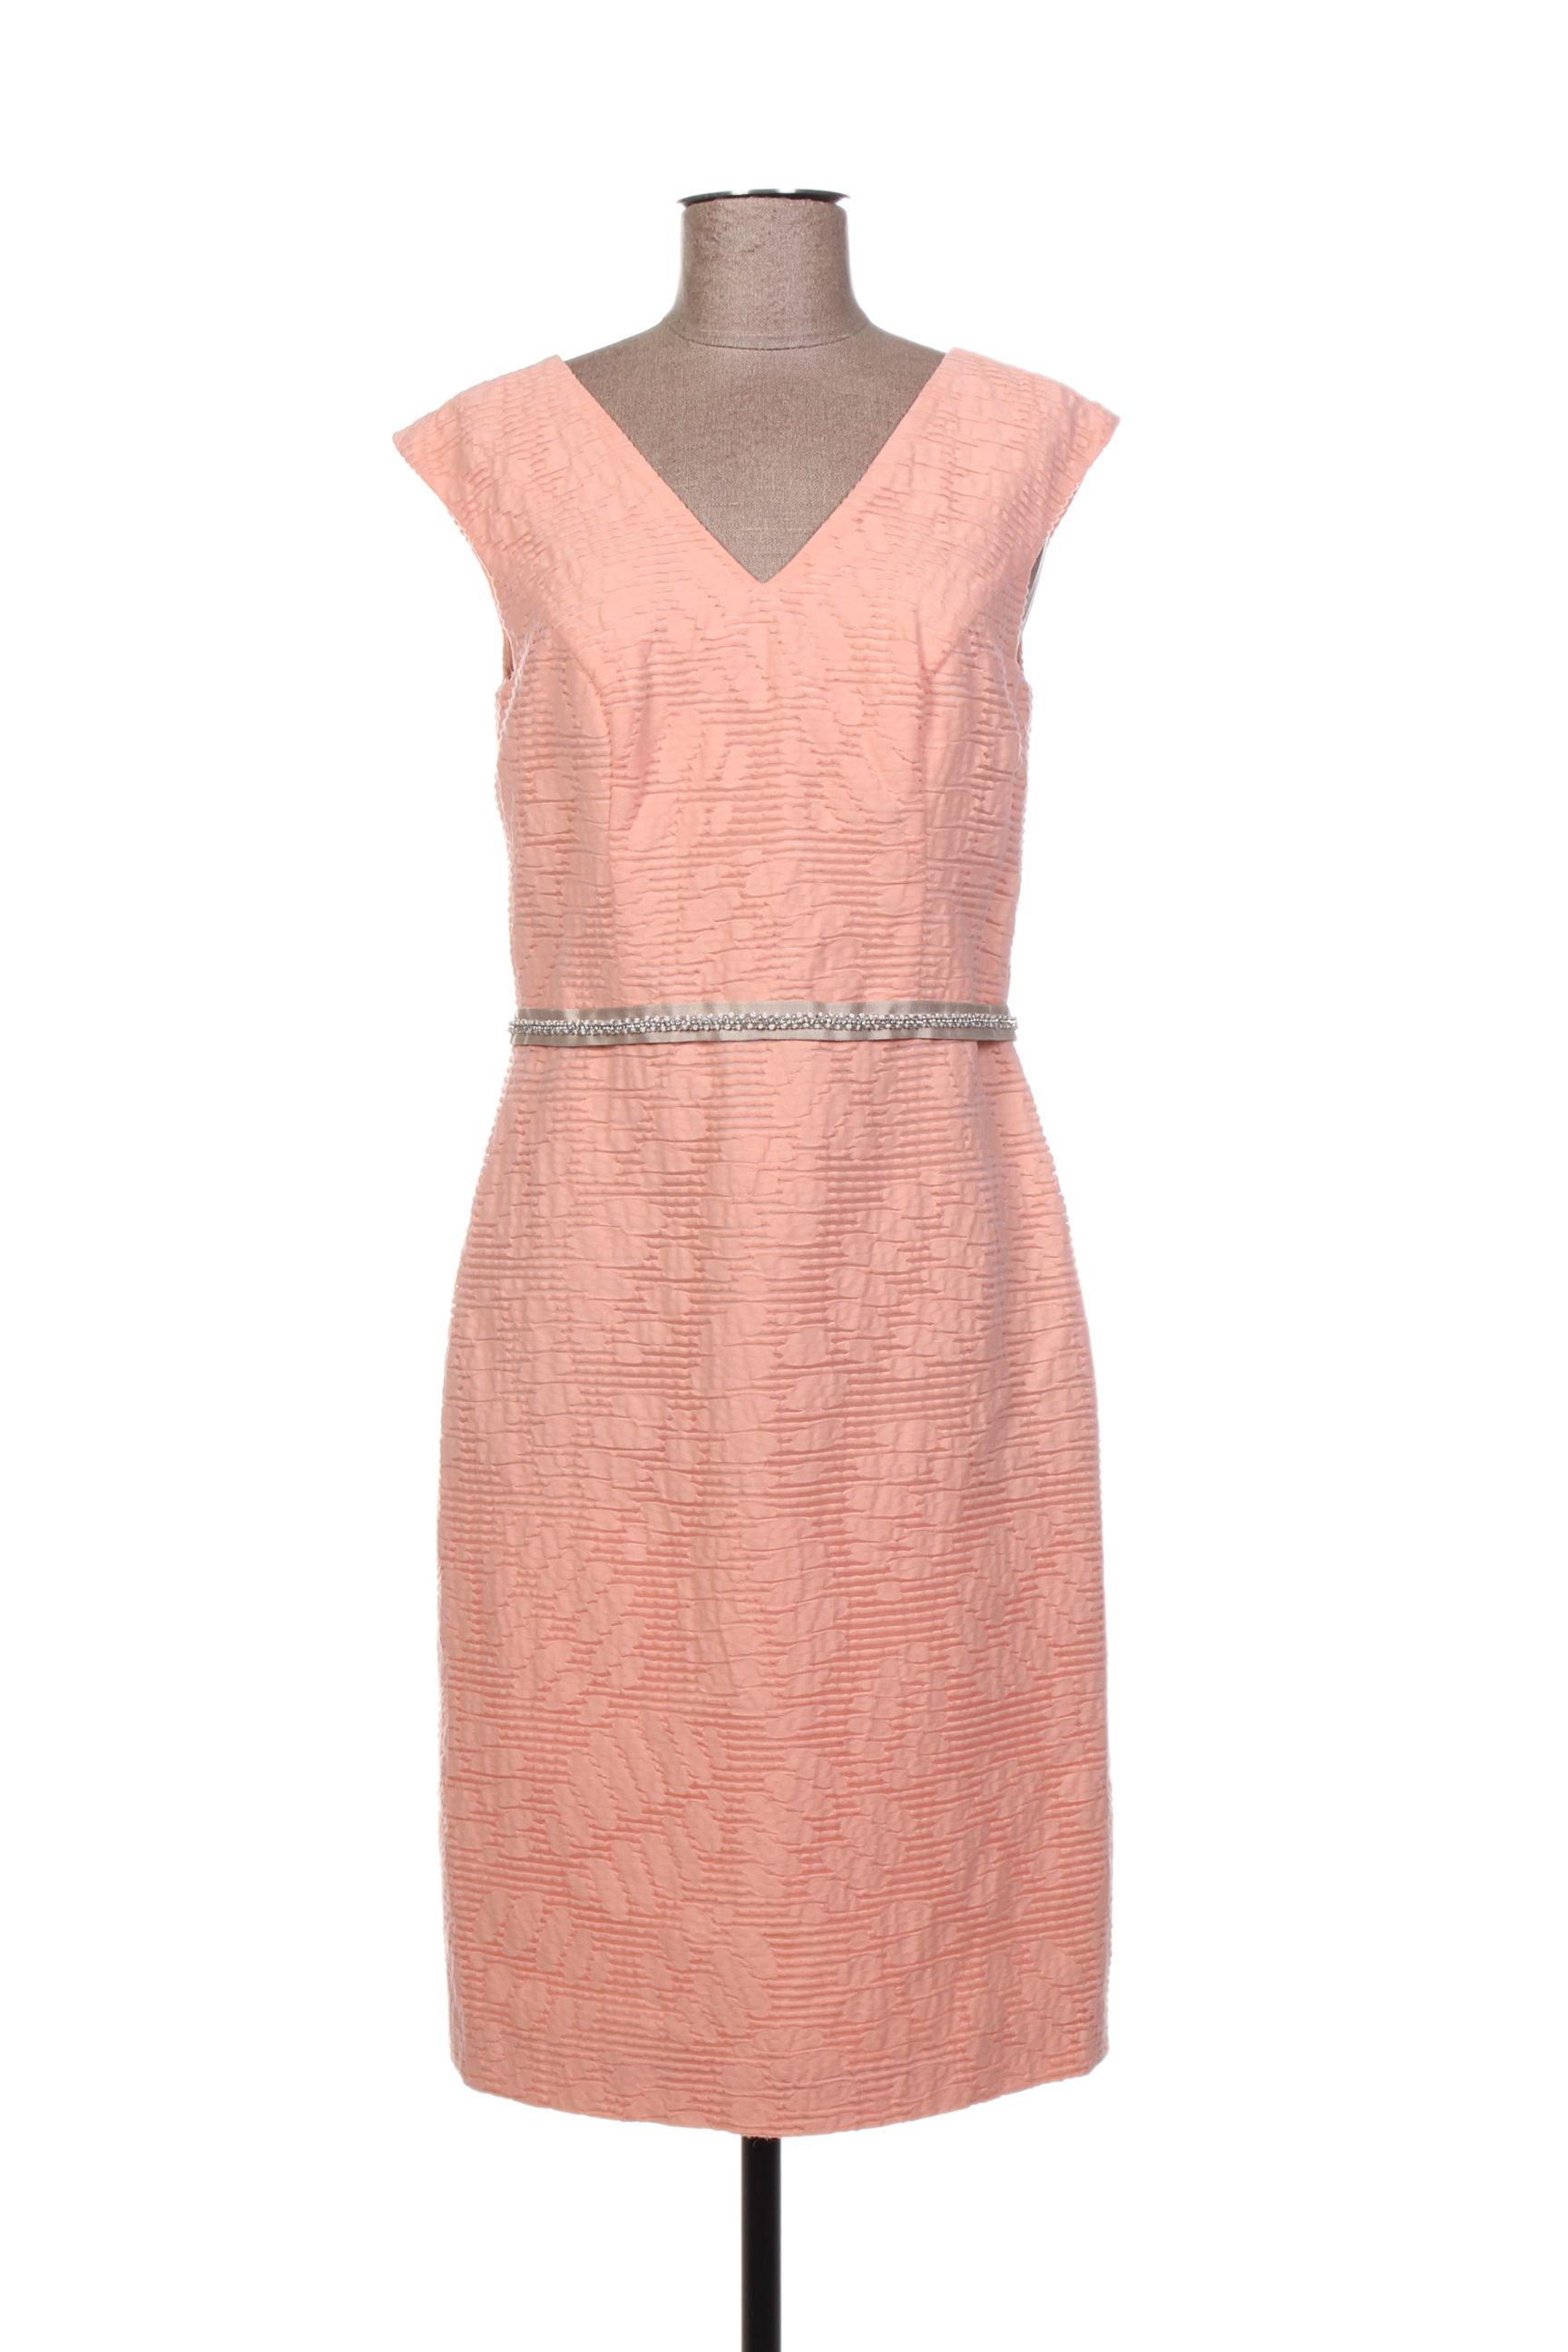 Robe mi-longue femme Linea Raffaelli rose taille : 42 198 FR (FR)